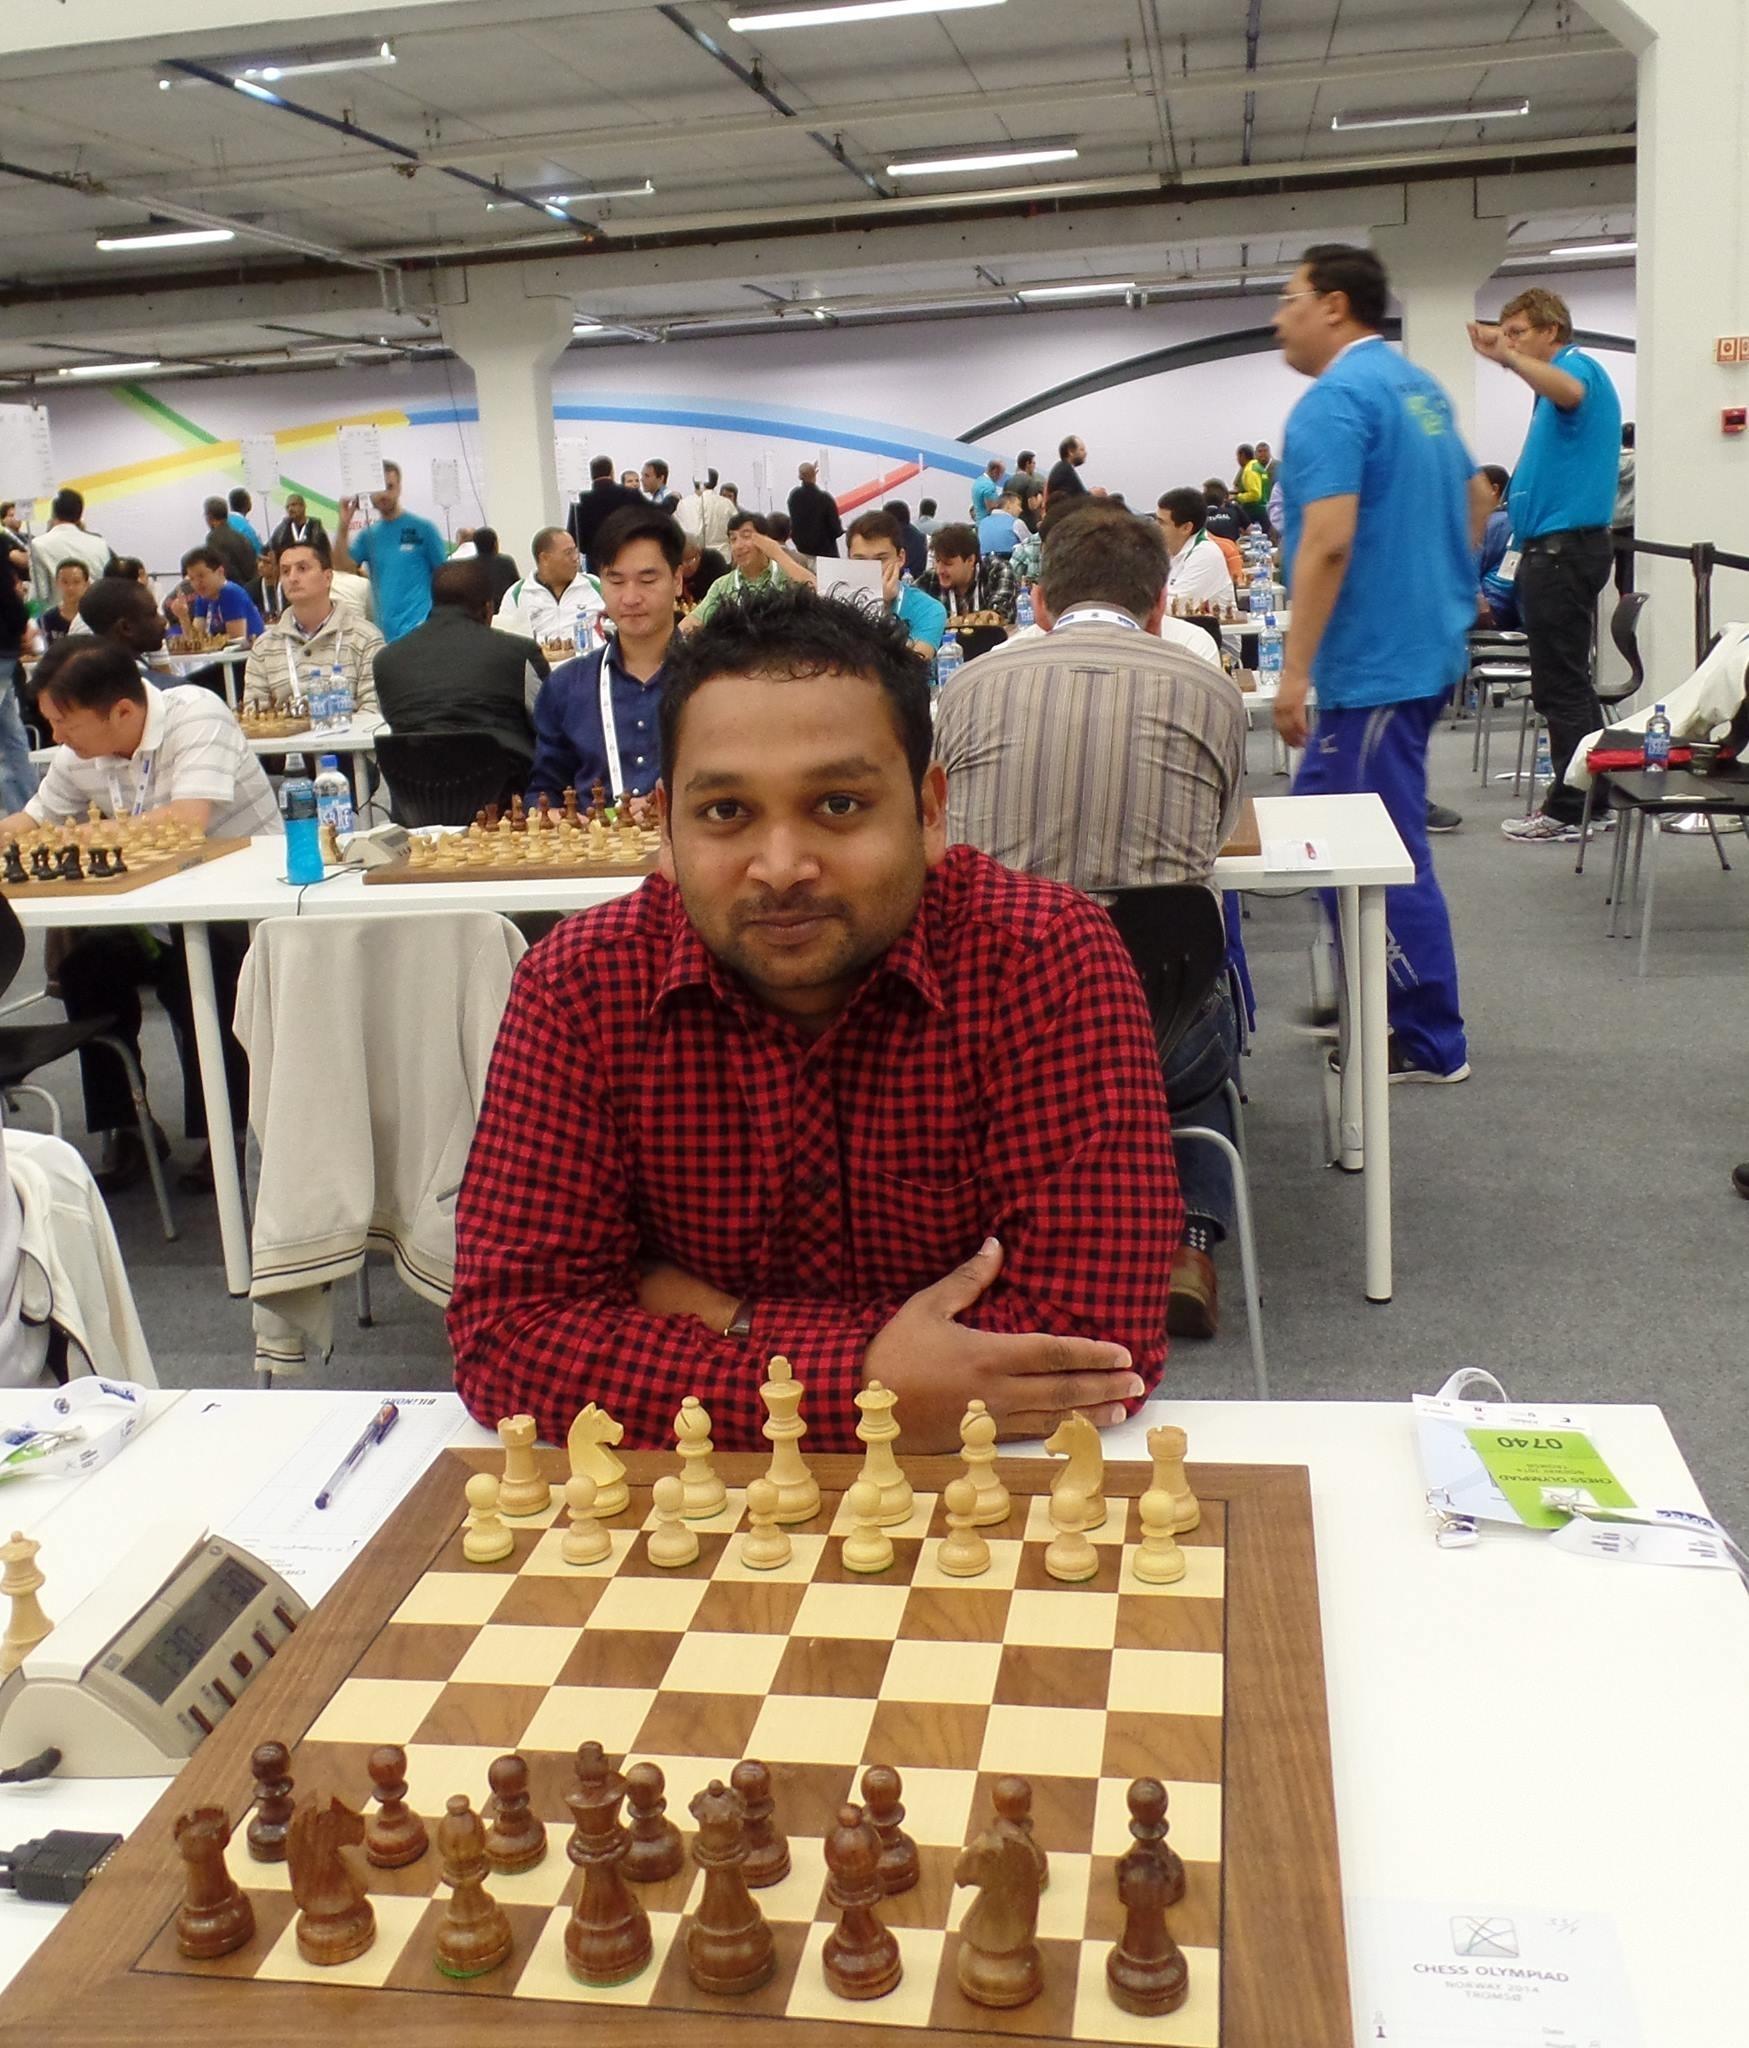 Sri Lankan Chess Championship - Wikipedia  18 August 1987 In Sri Lanka